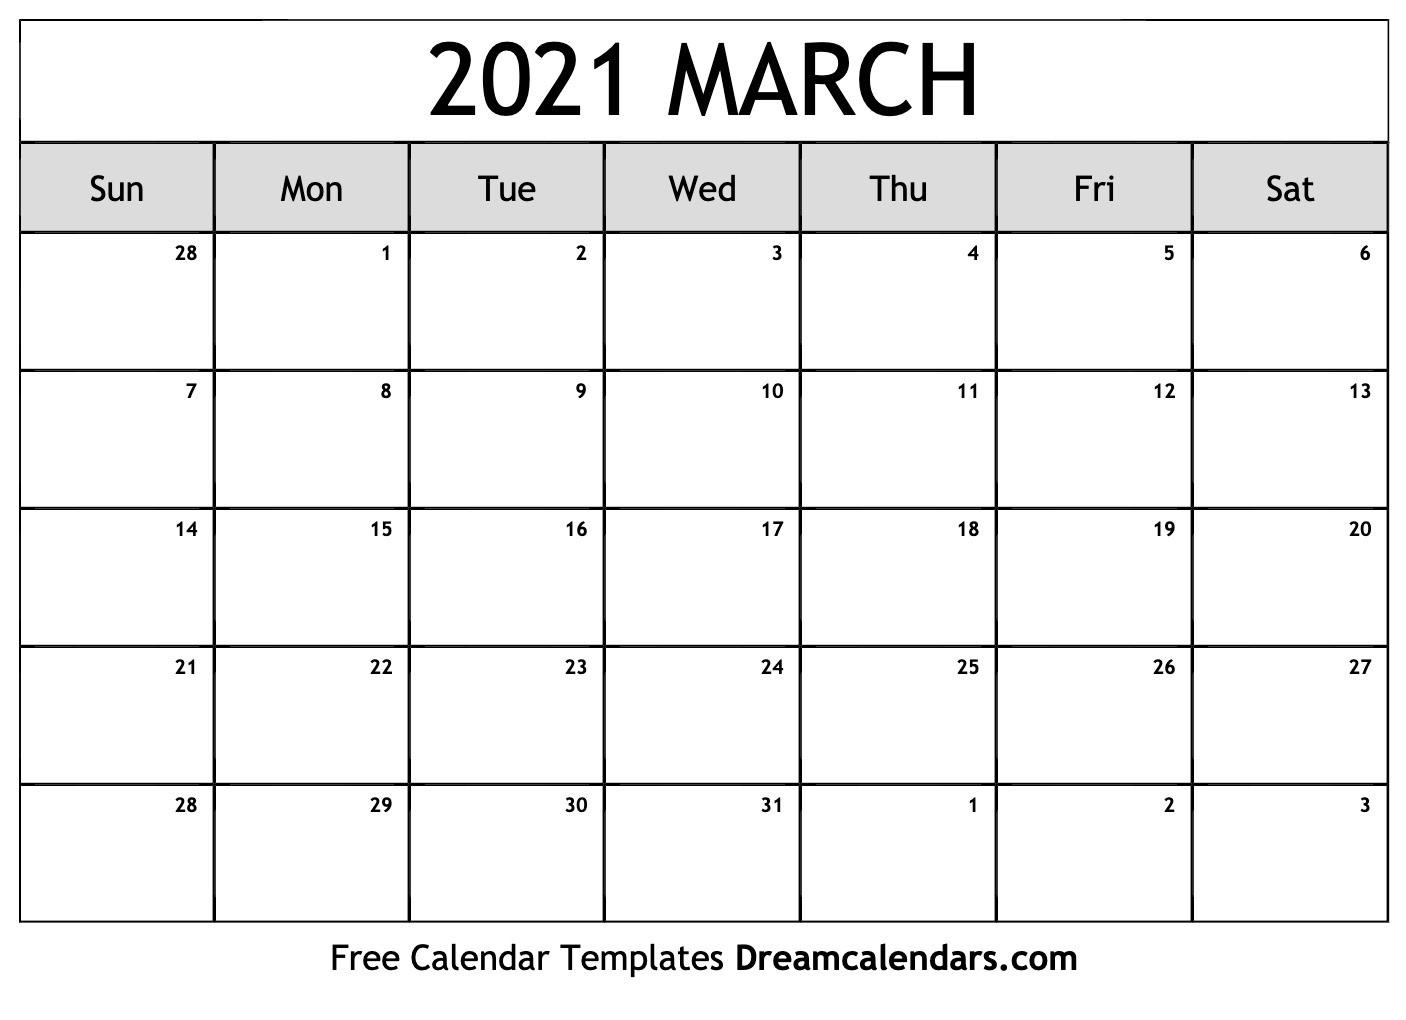 March 2021 Calendar | Free Blank Printable Templates  Free Printable Monthly Calendar March 2021